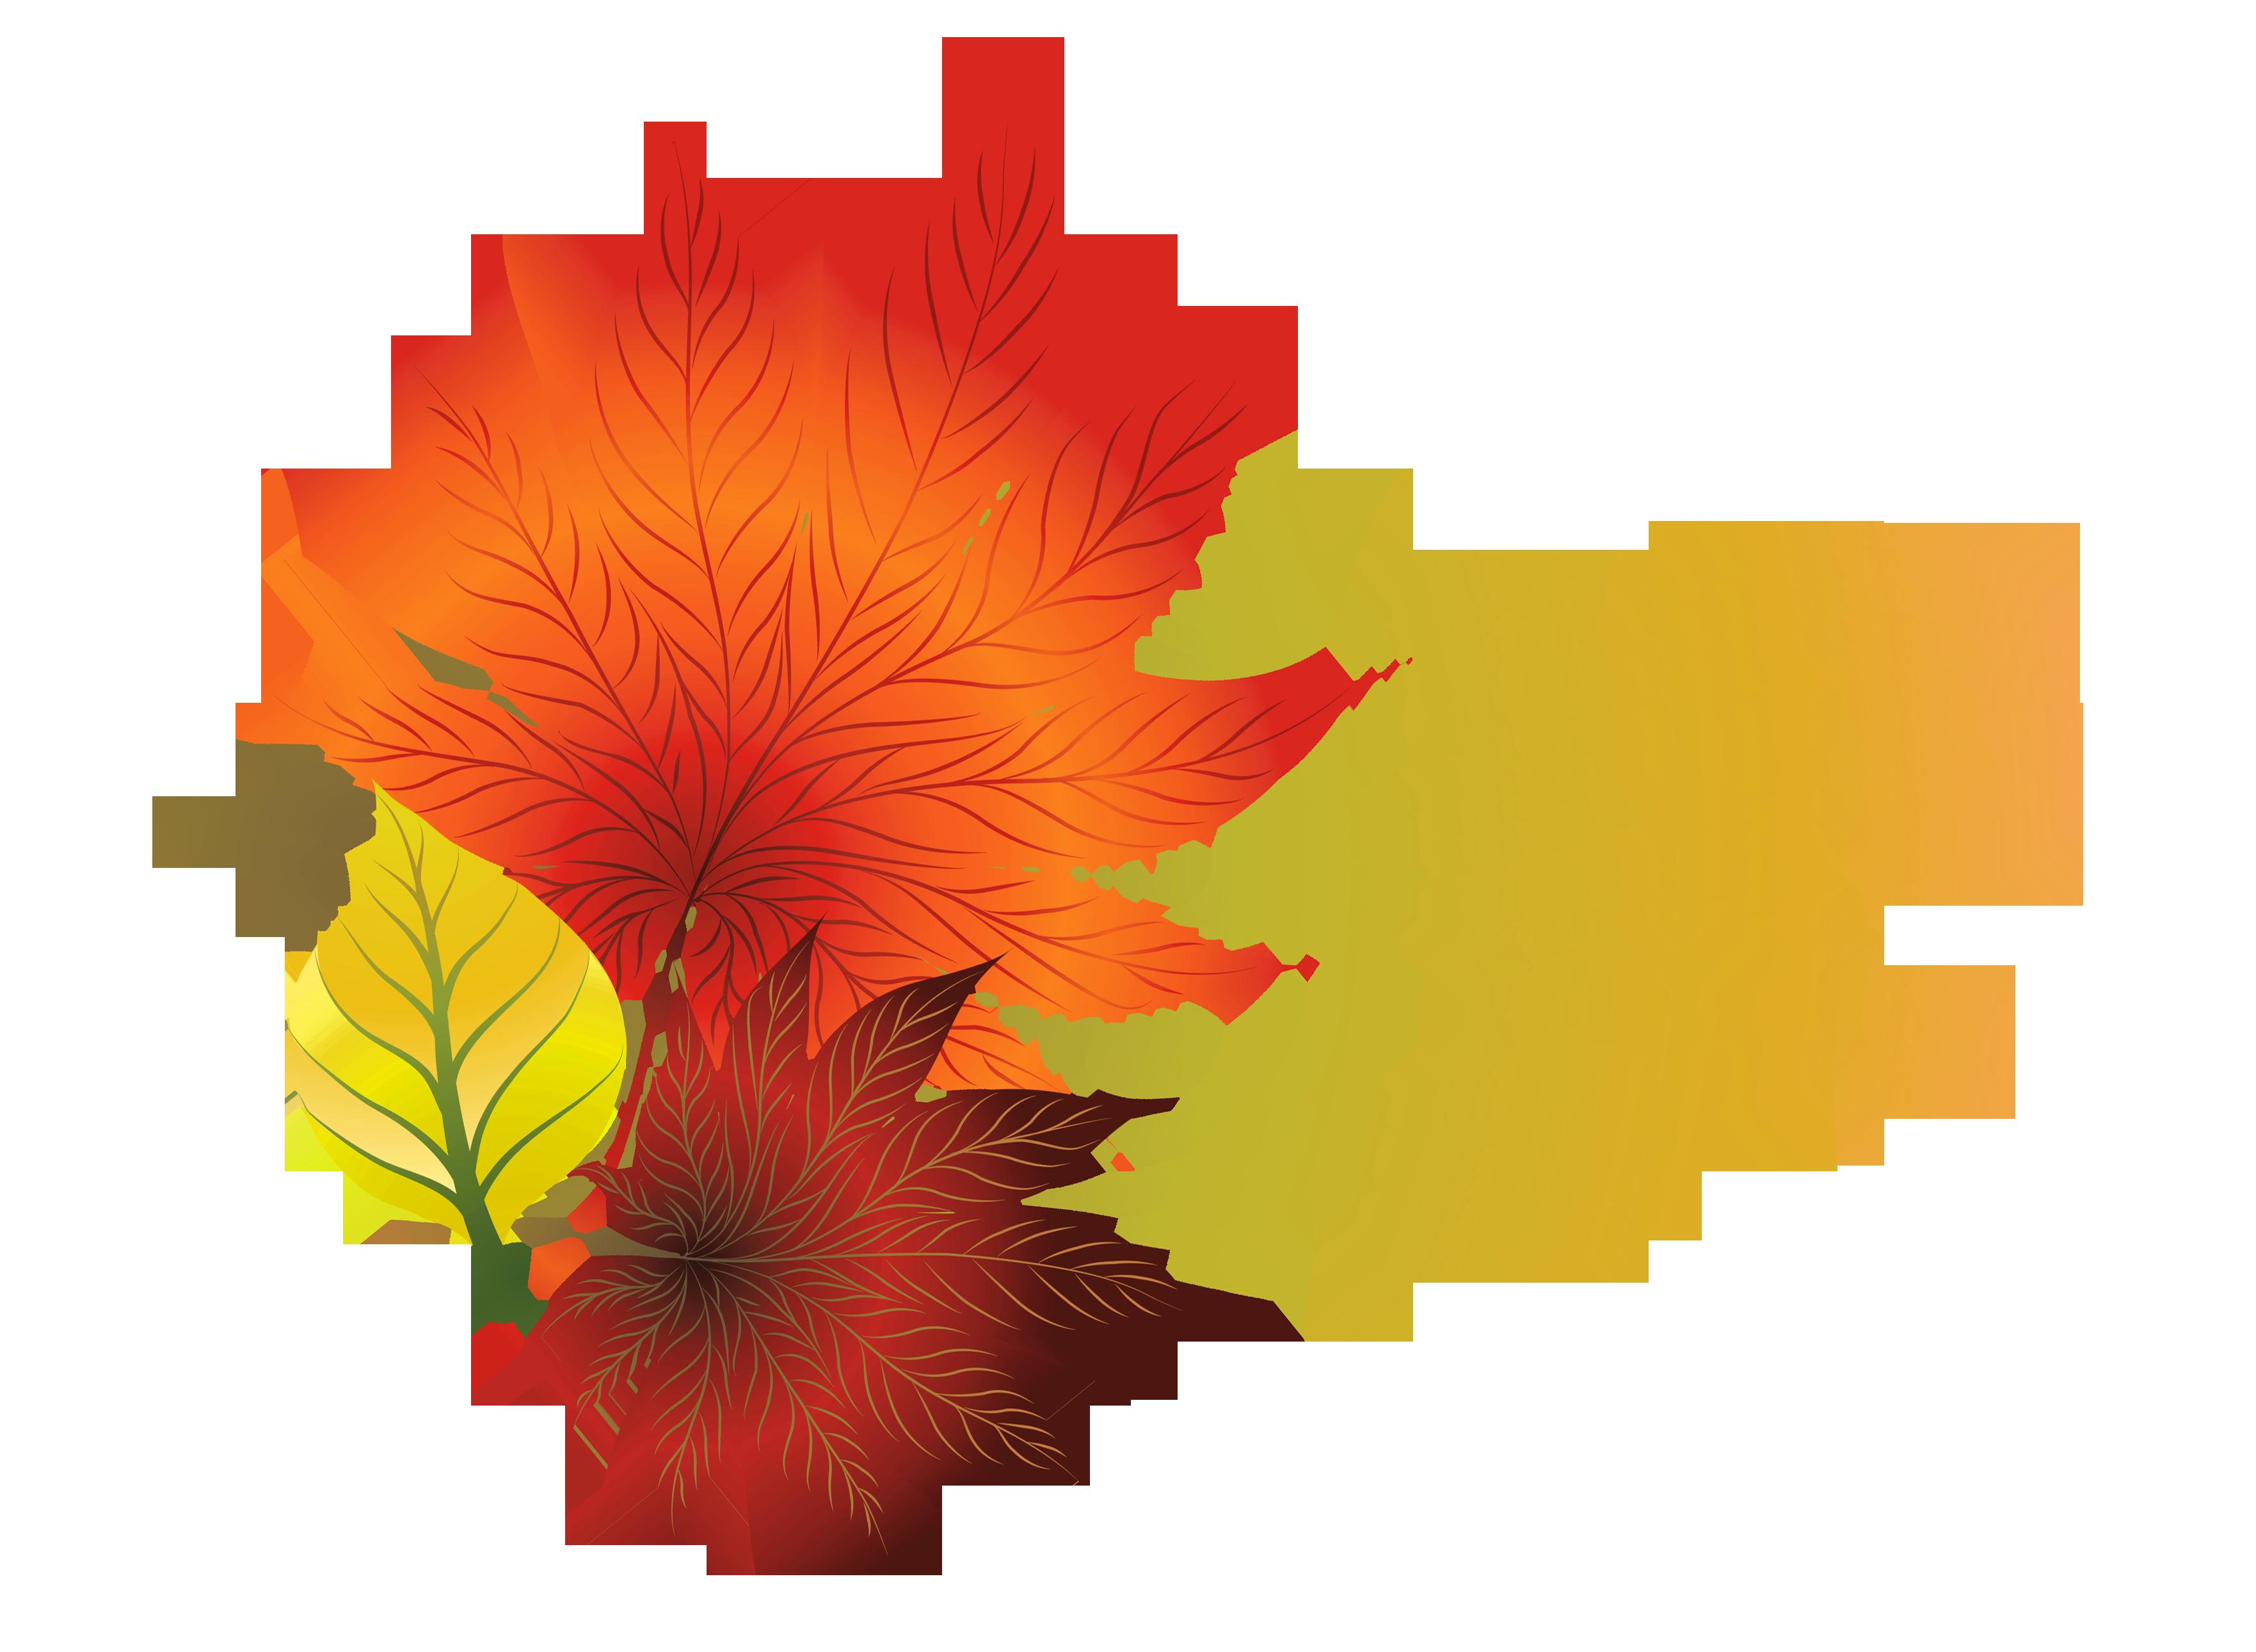 3525x2581 Top 83 Fall Leaf Clip Art